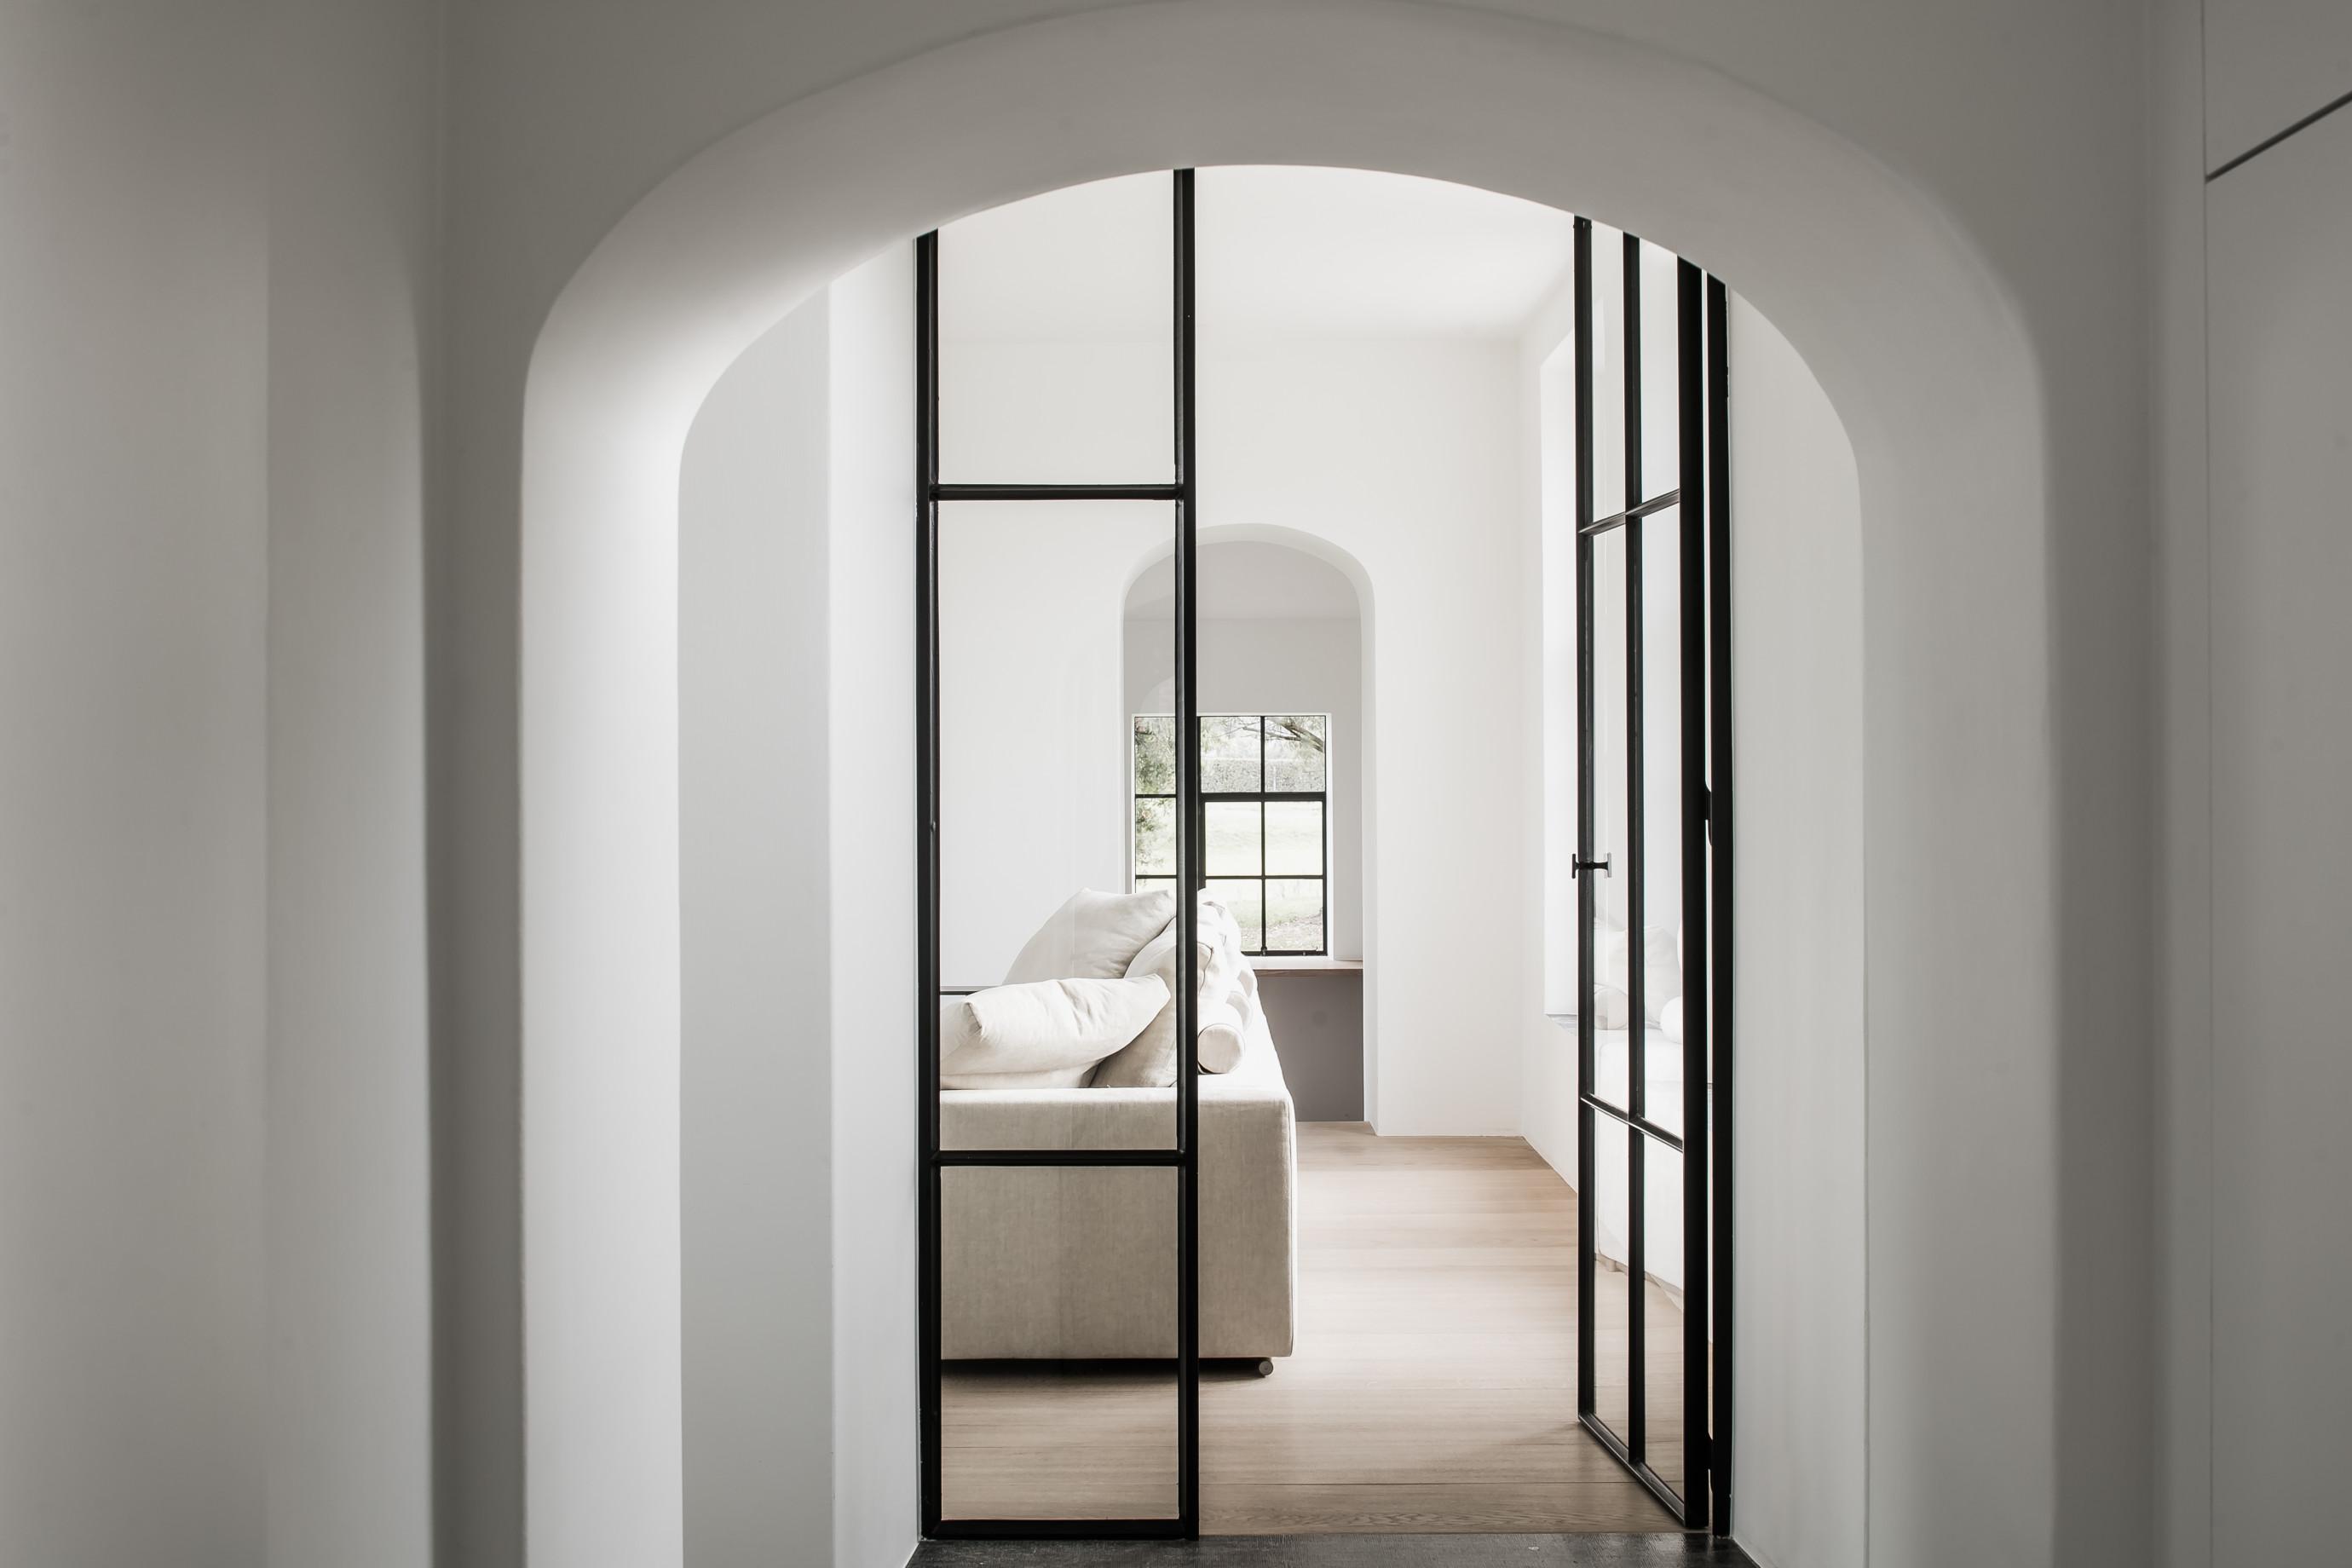 am designs-be Waasmunster-28